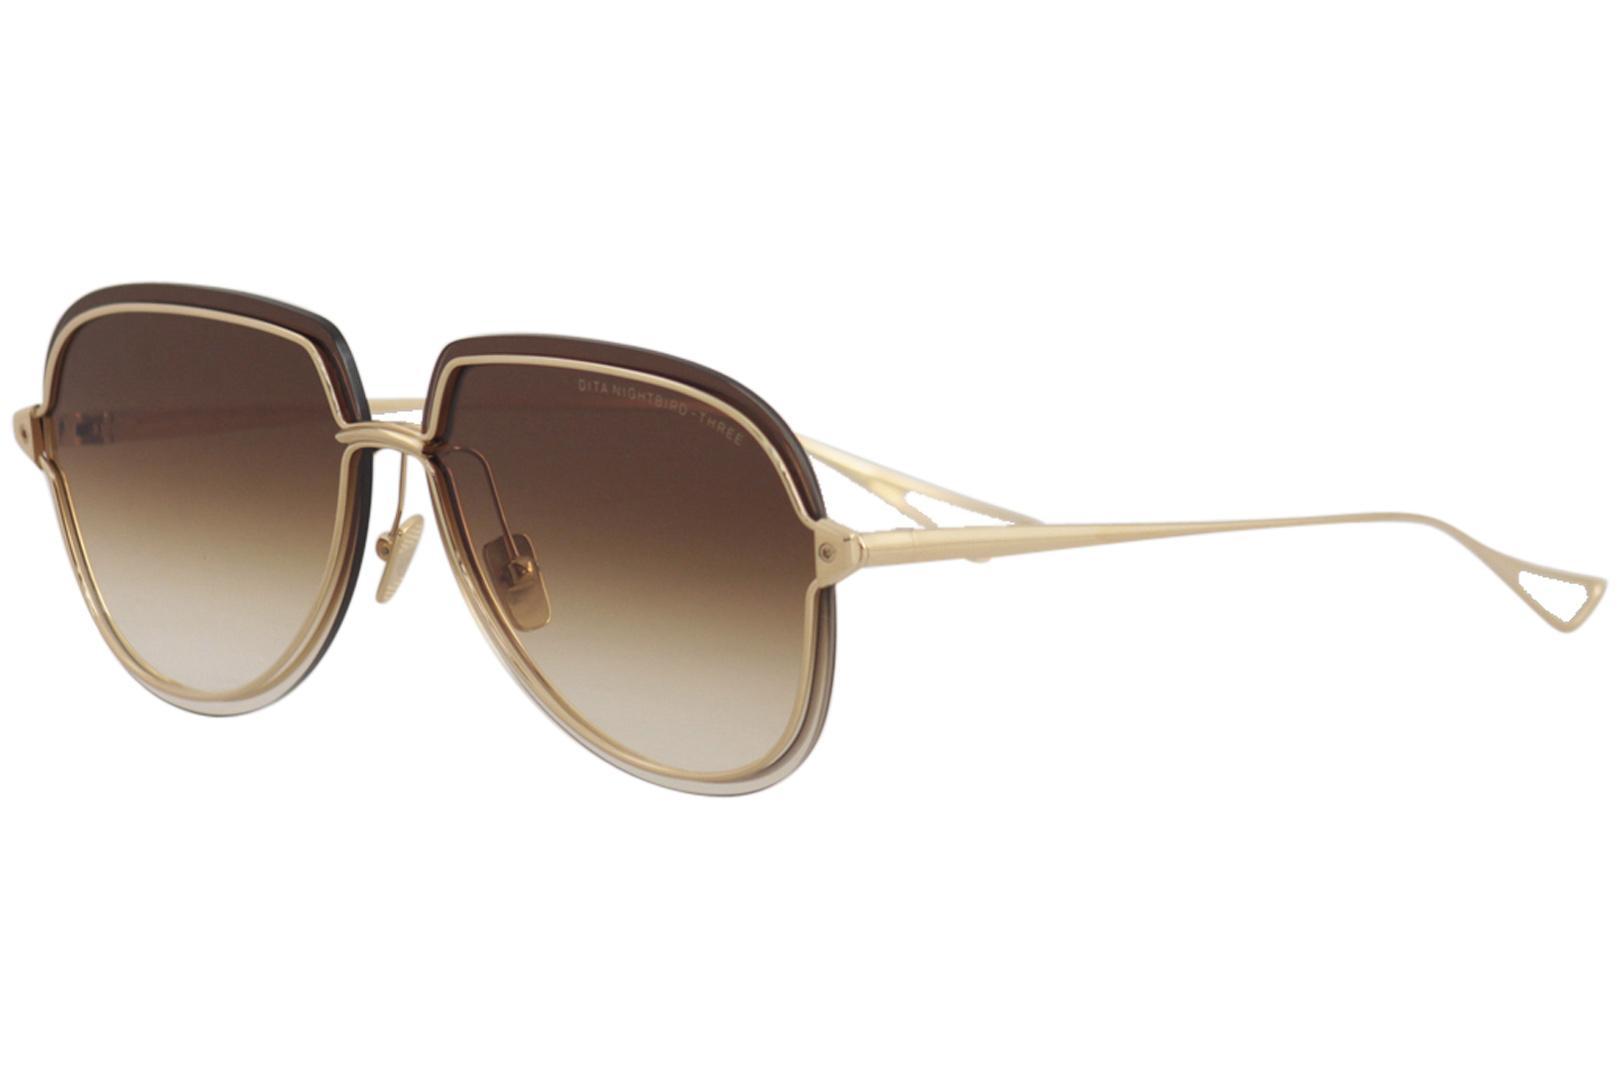 db54eeda400 Dita Women s Nightbird-Three DTX520 DTX 520 Fashion Pilot Sunglasses by  Dita. Touch to zoom